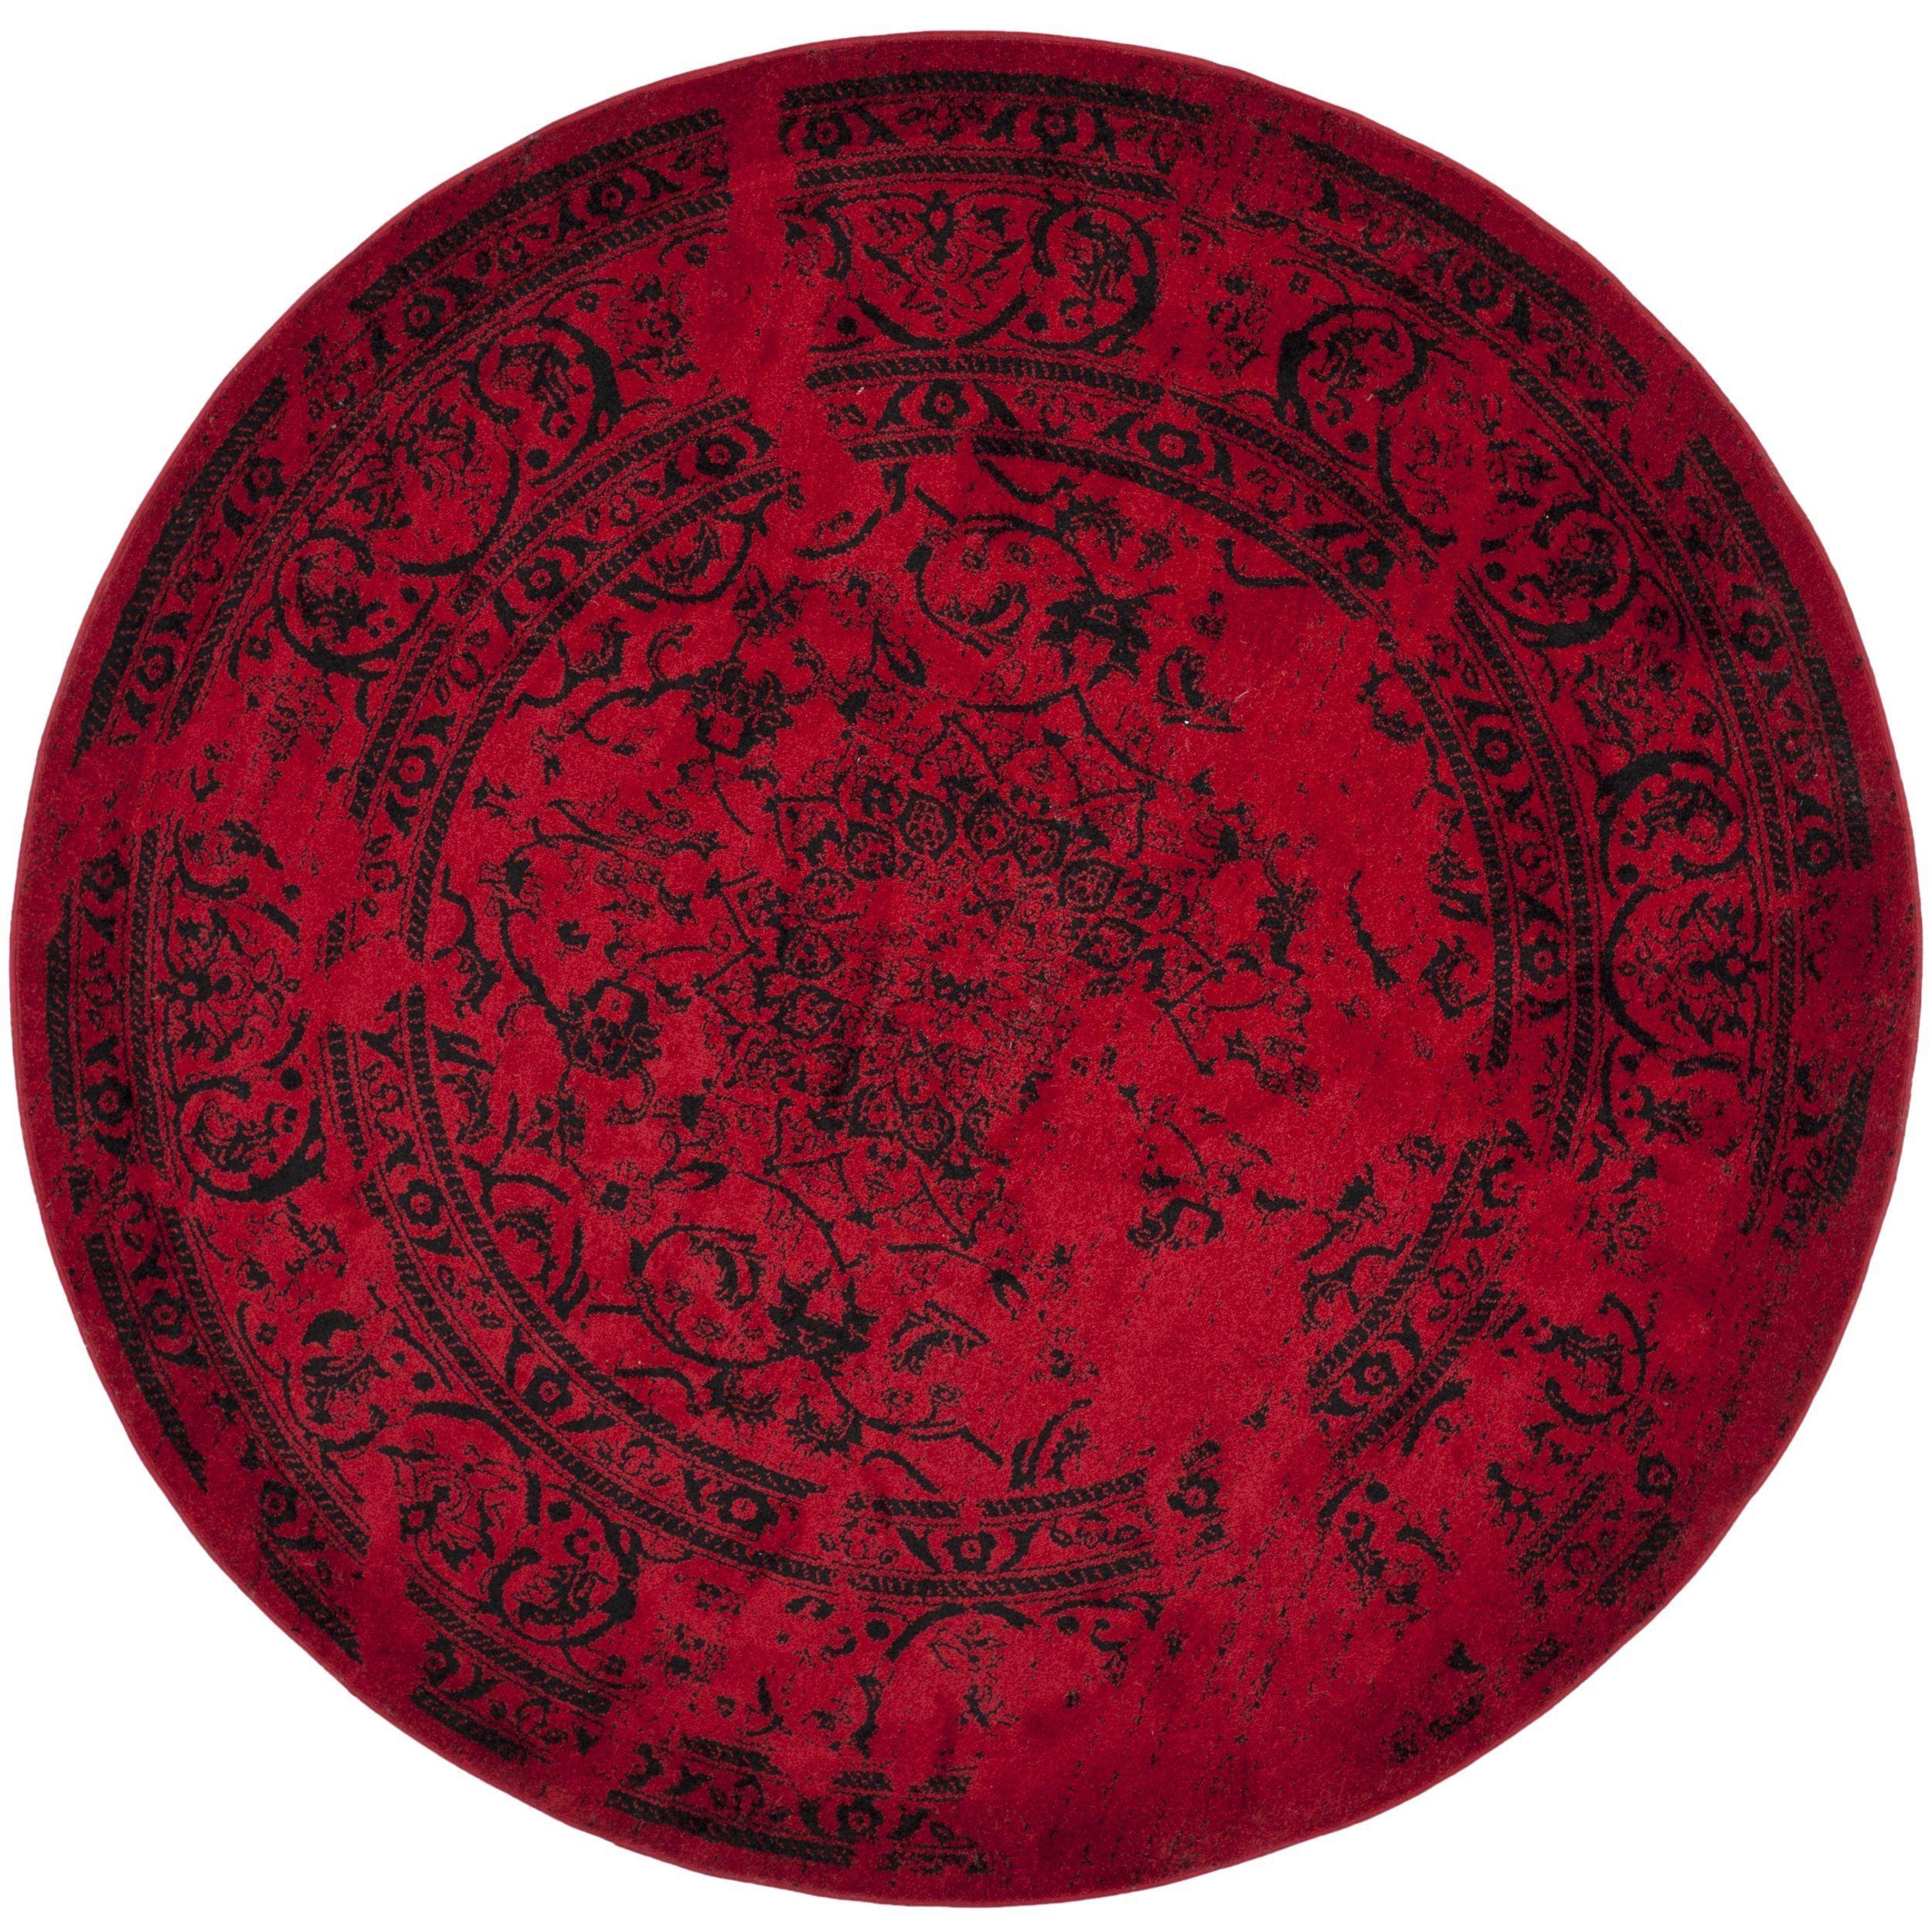 Safavieh Adirondack Vintage Overdyed Red Black Rug 6